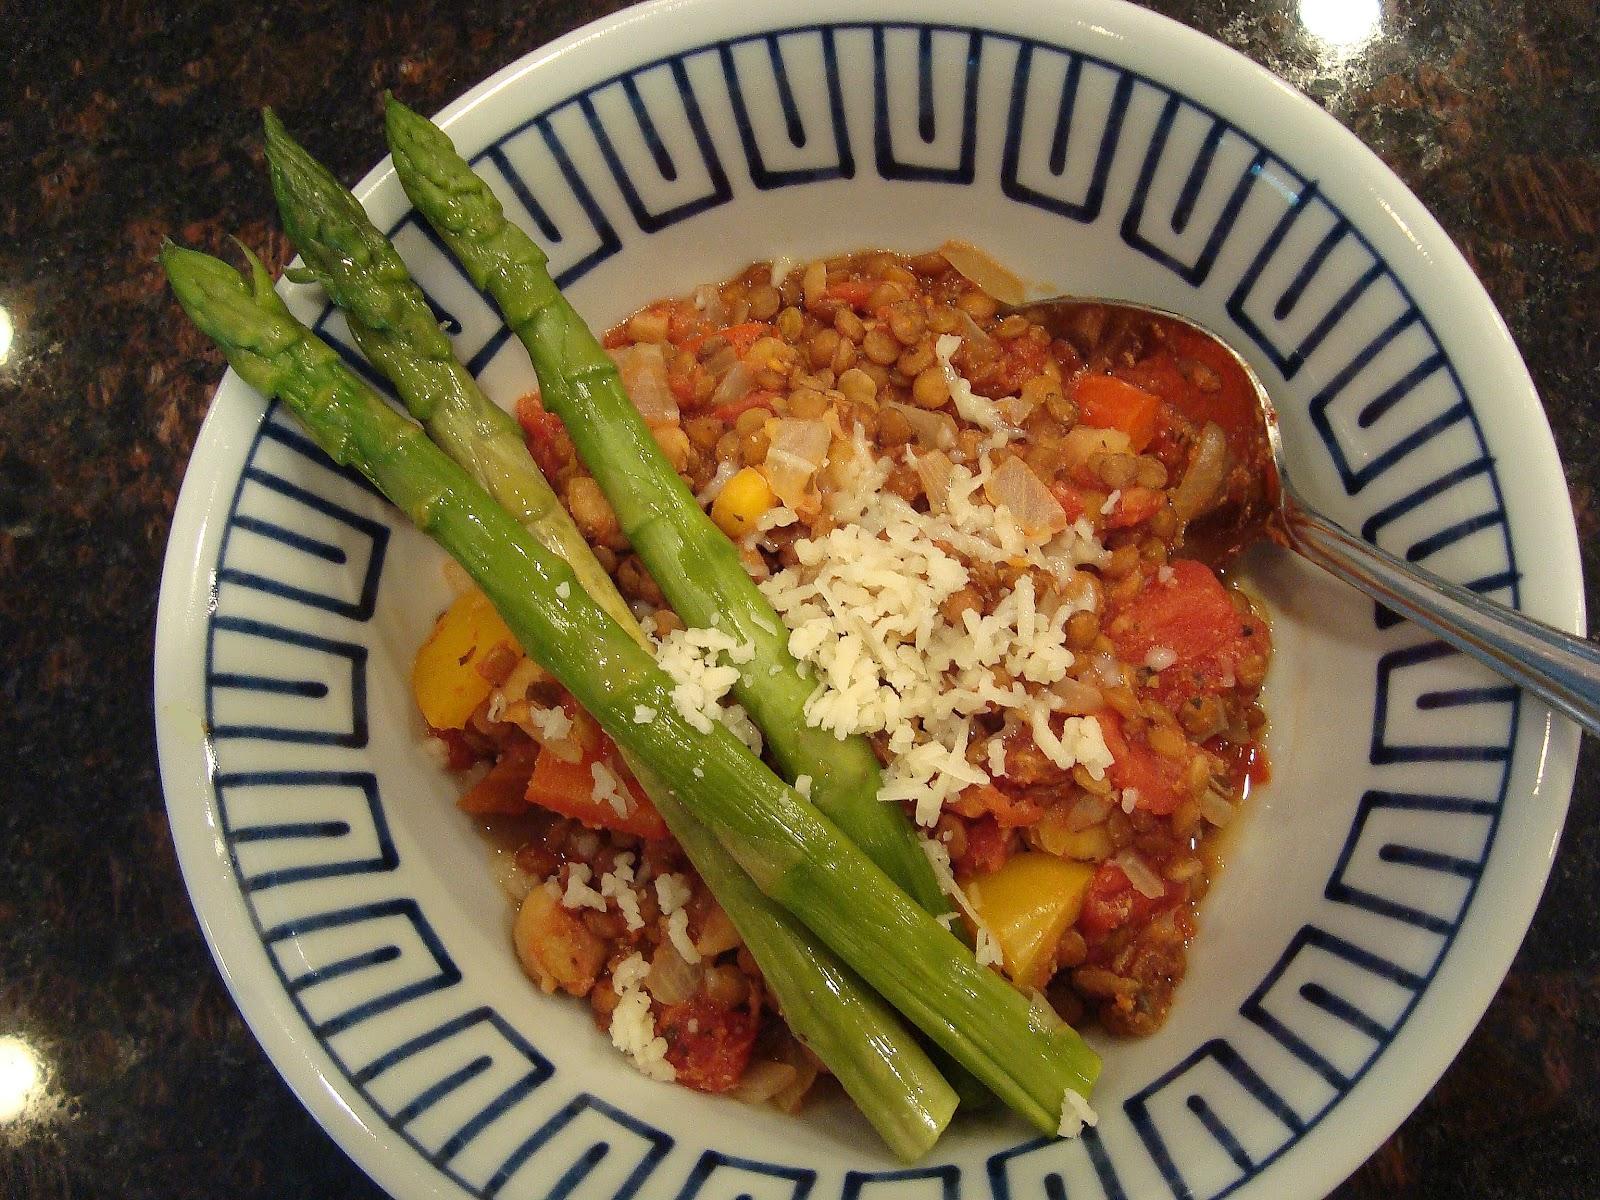 http://hugsandkiwis.blogspot.com/2012/08/italian-infused-tomato-lentil-soup.html